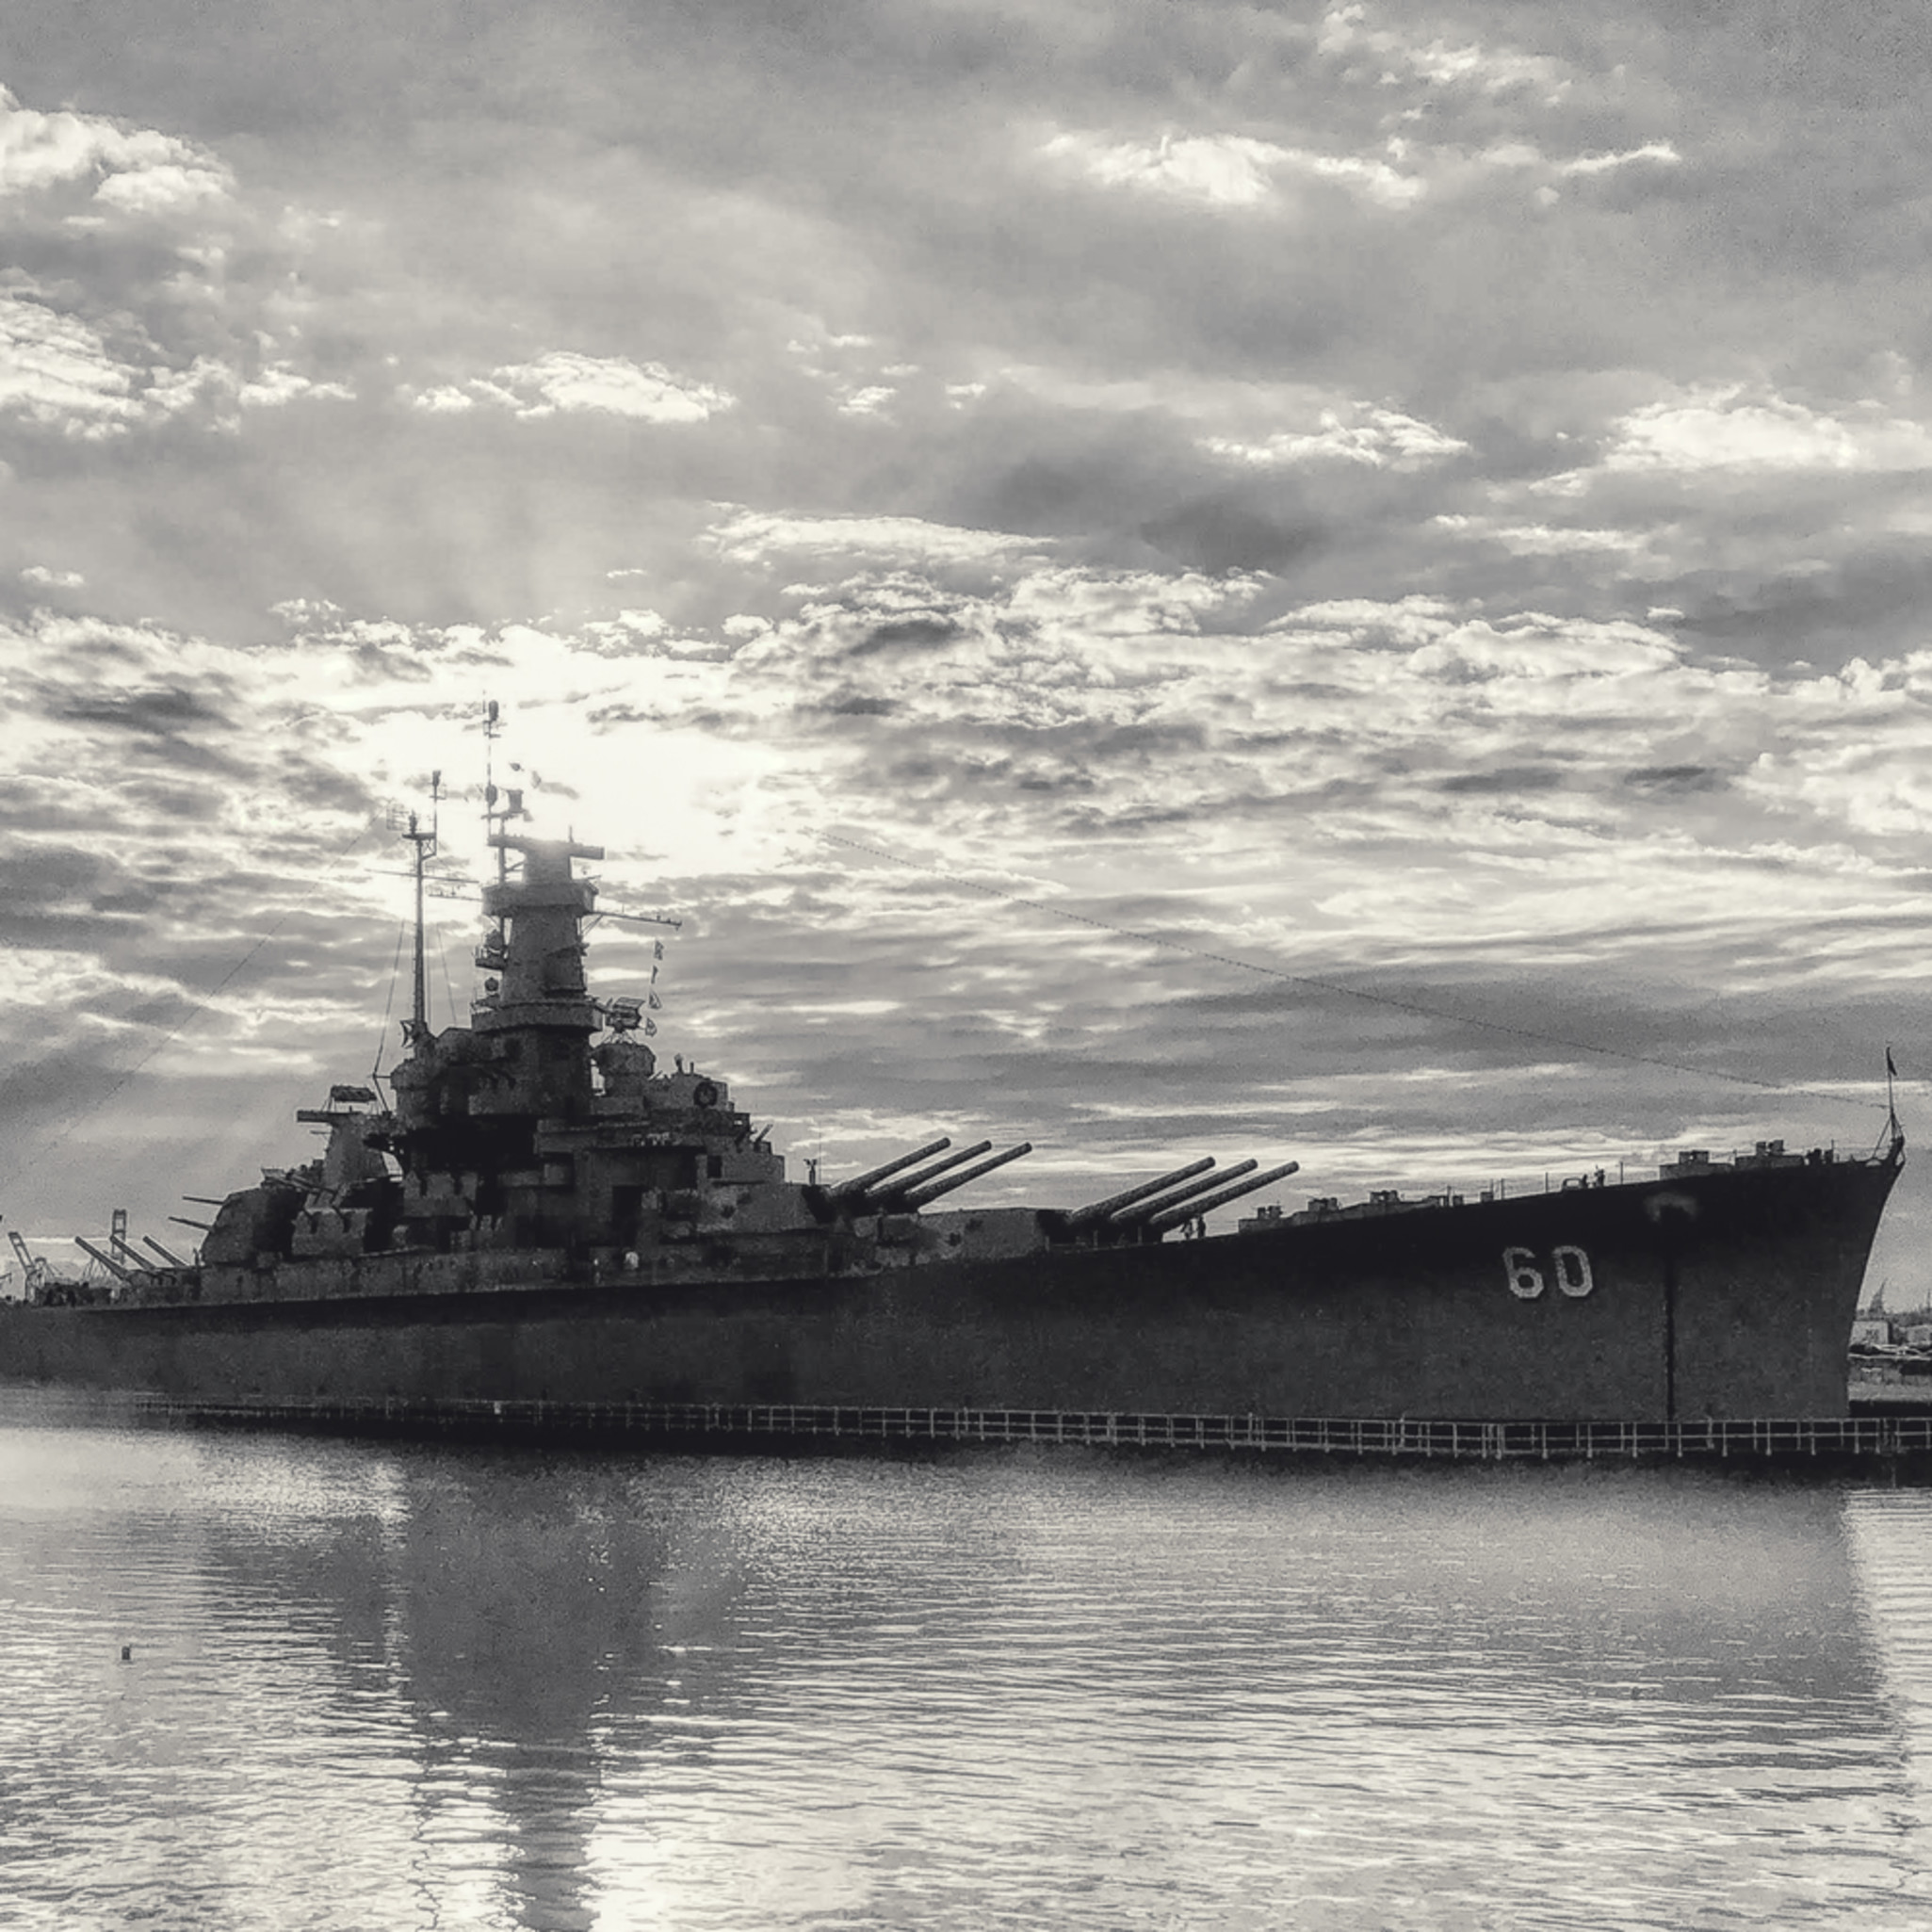 Foggy battleship 15 edit jnlyk8